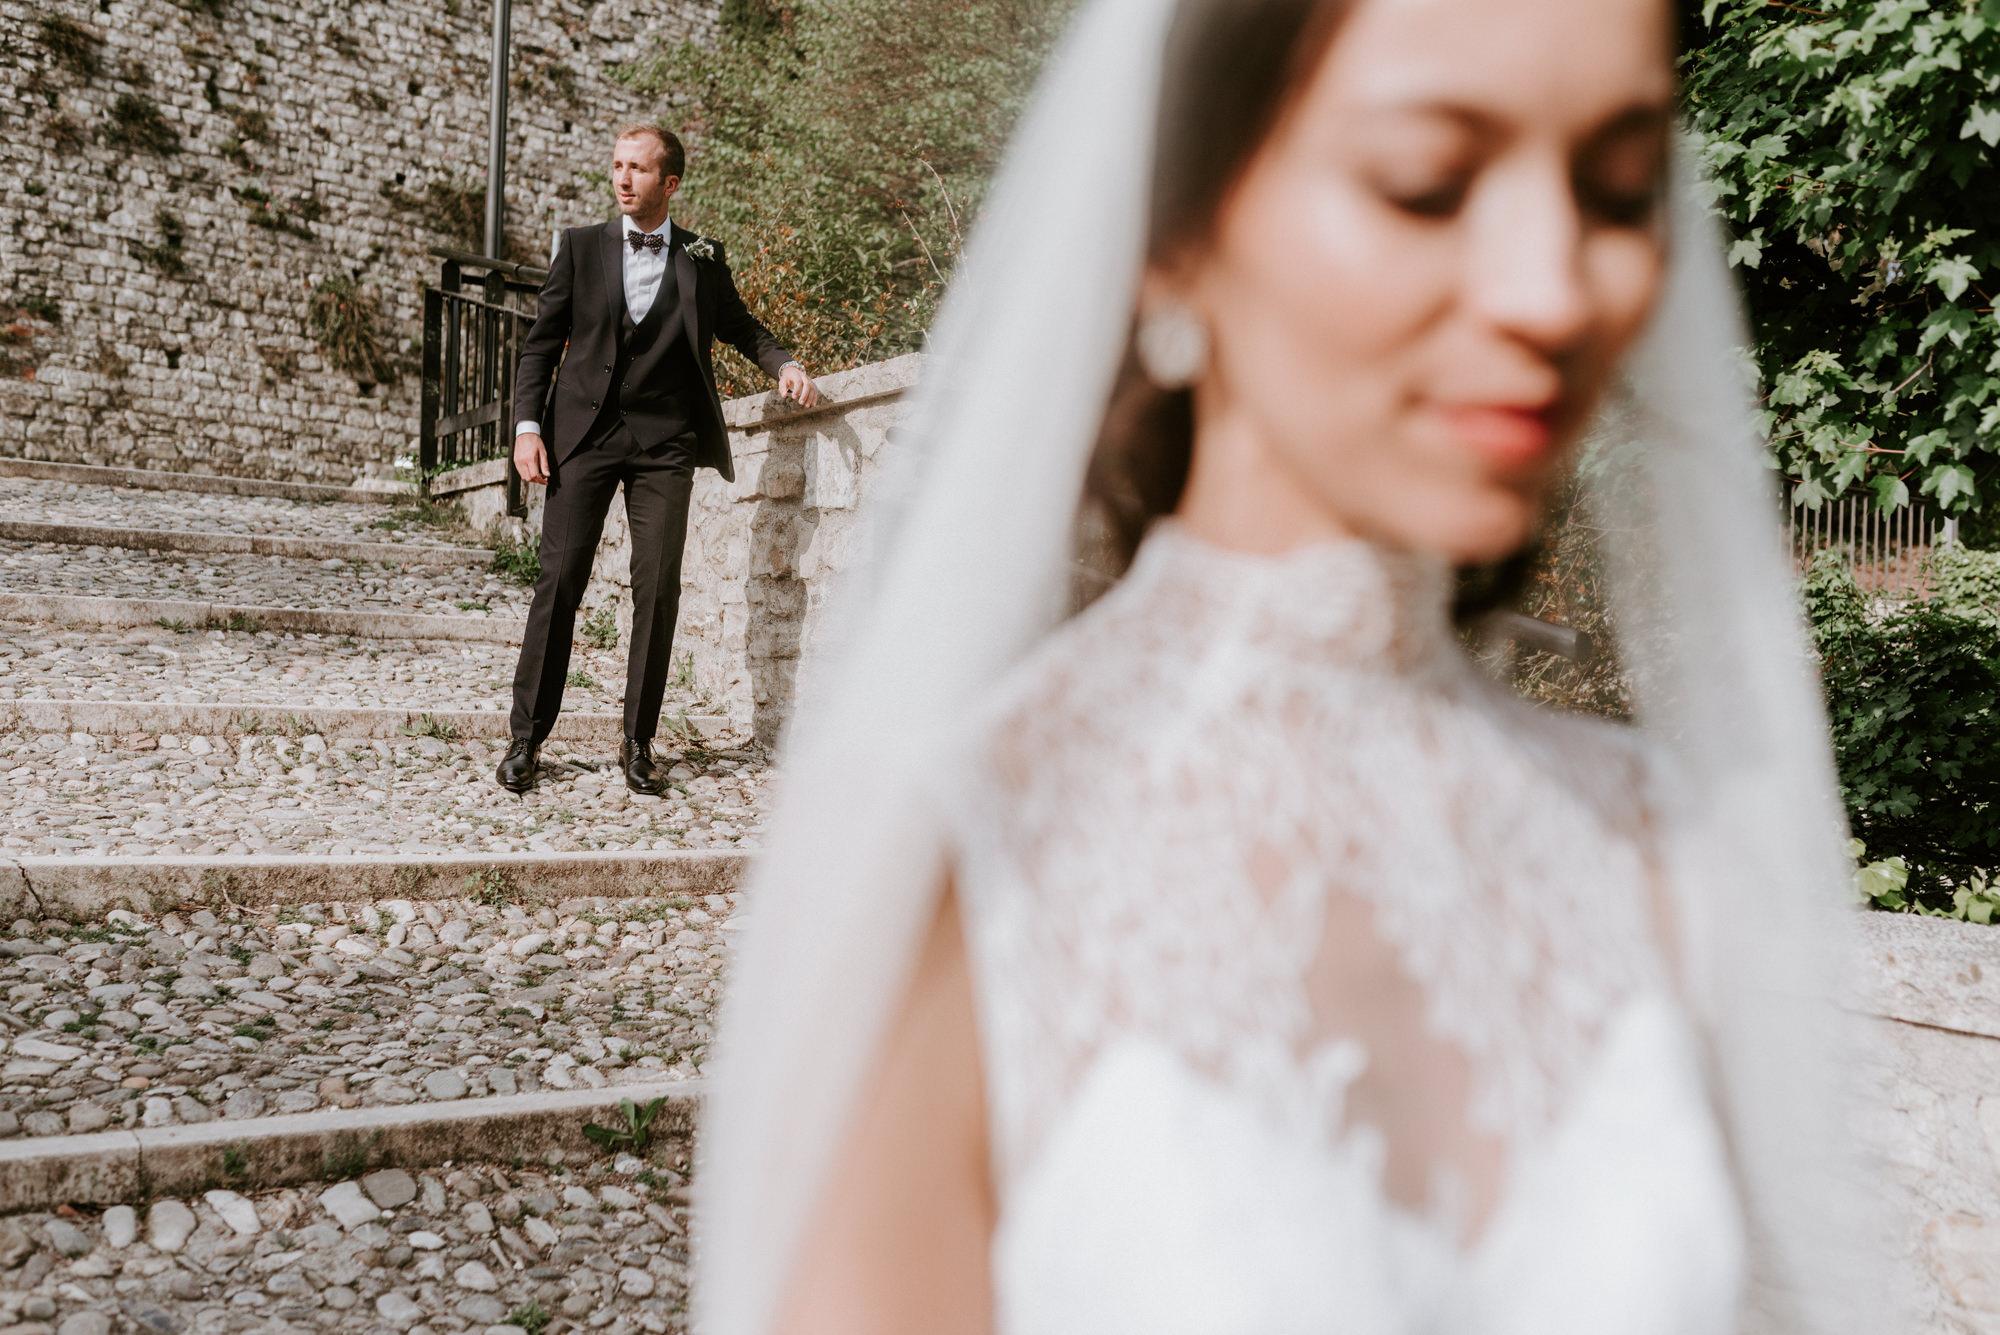 FOTO+PHOTO+BODA+WEDDING+ITALIA+ITALY+MAURICIO+GARAY+MAURICIOGARAY+WEDDINPHOTOGRAPHER+FOTOGRAFODEBODA-1209.jpg